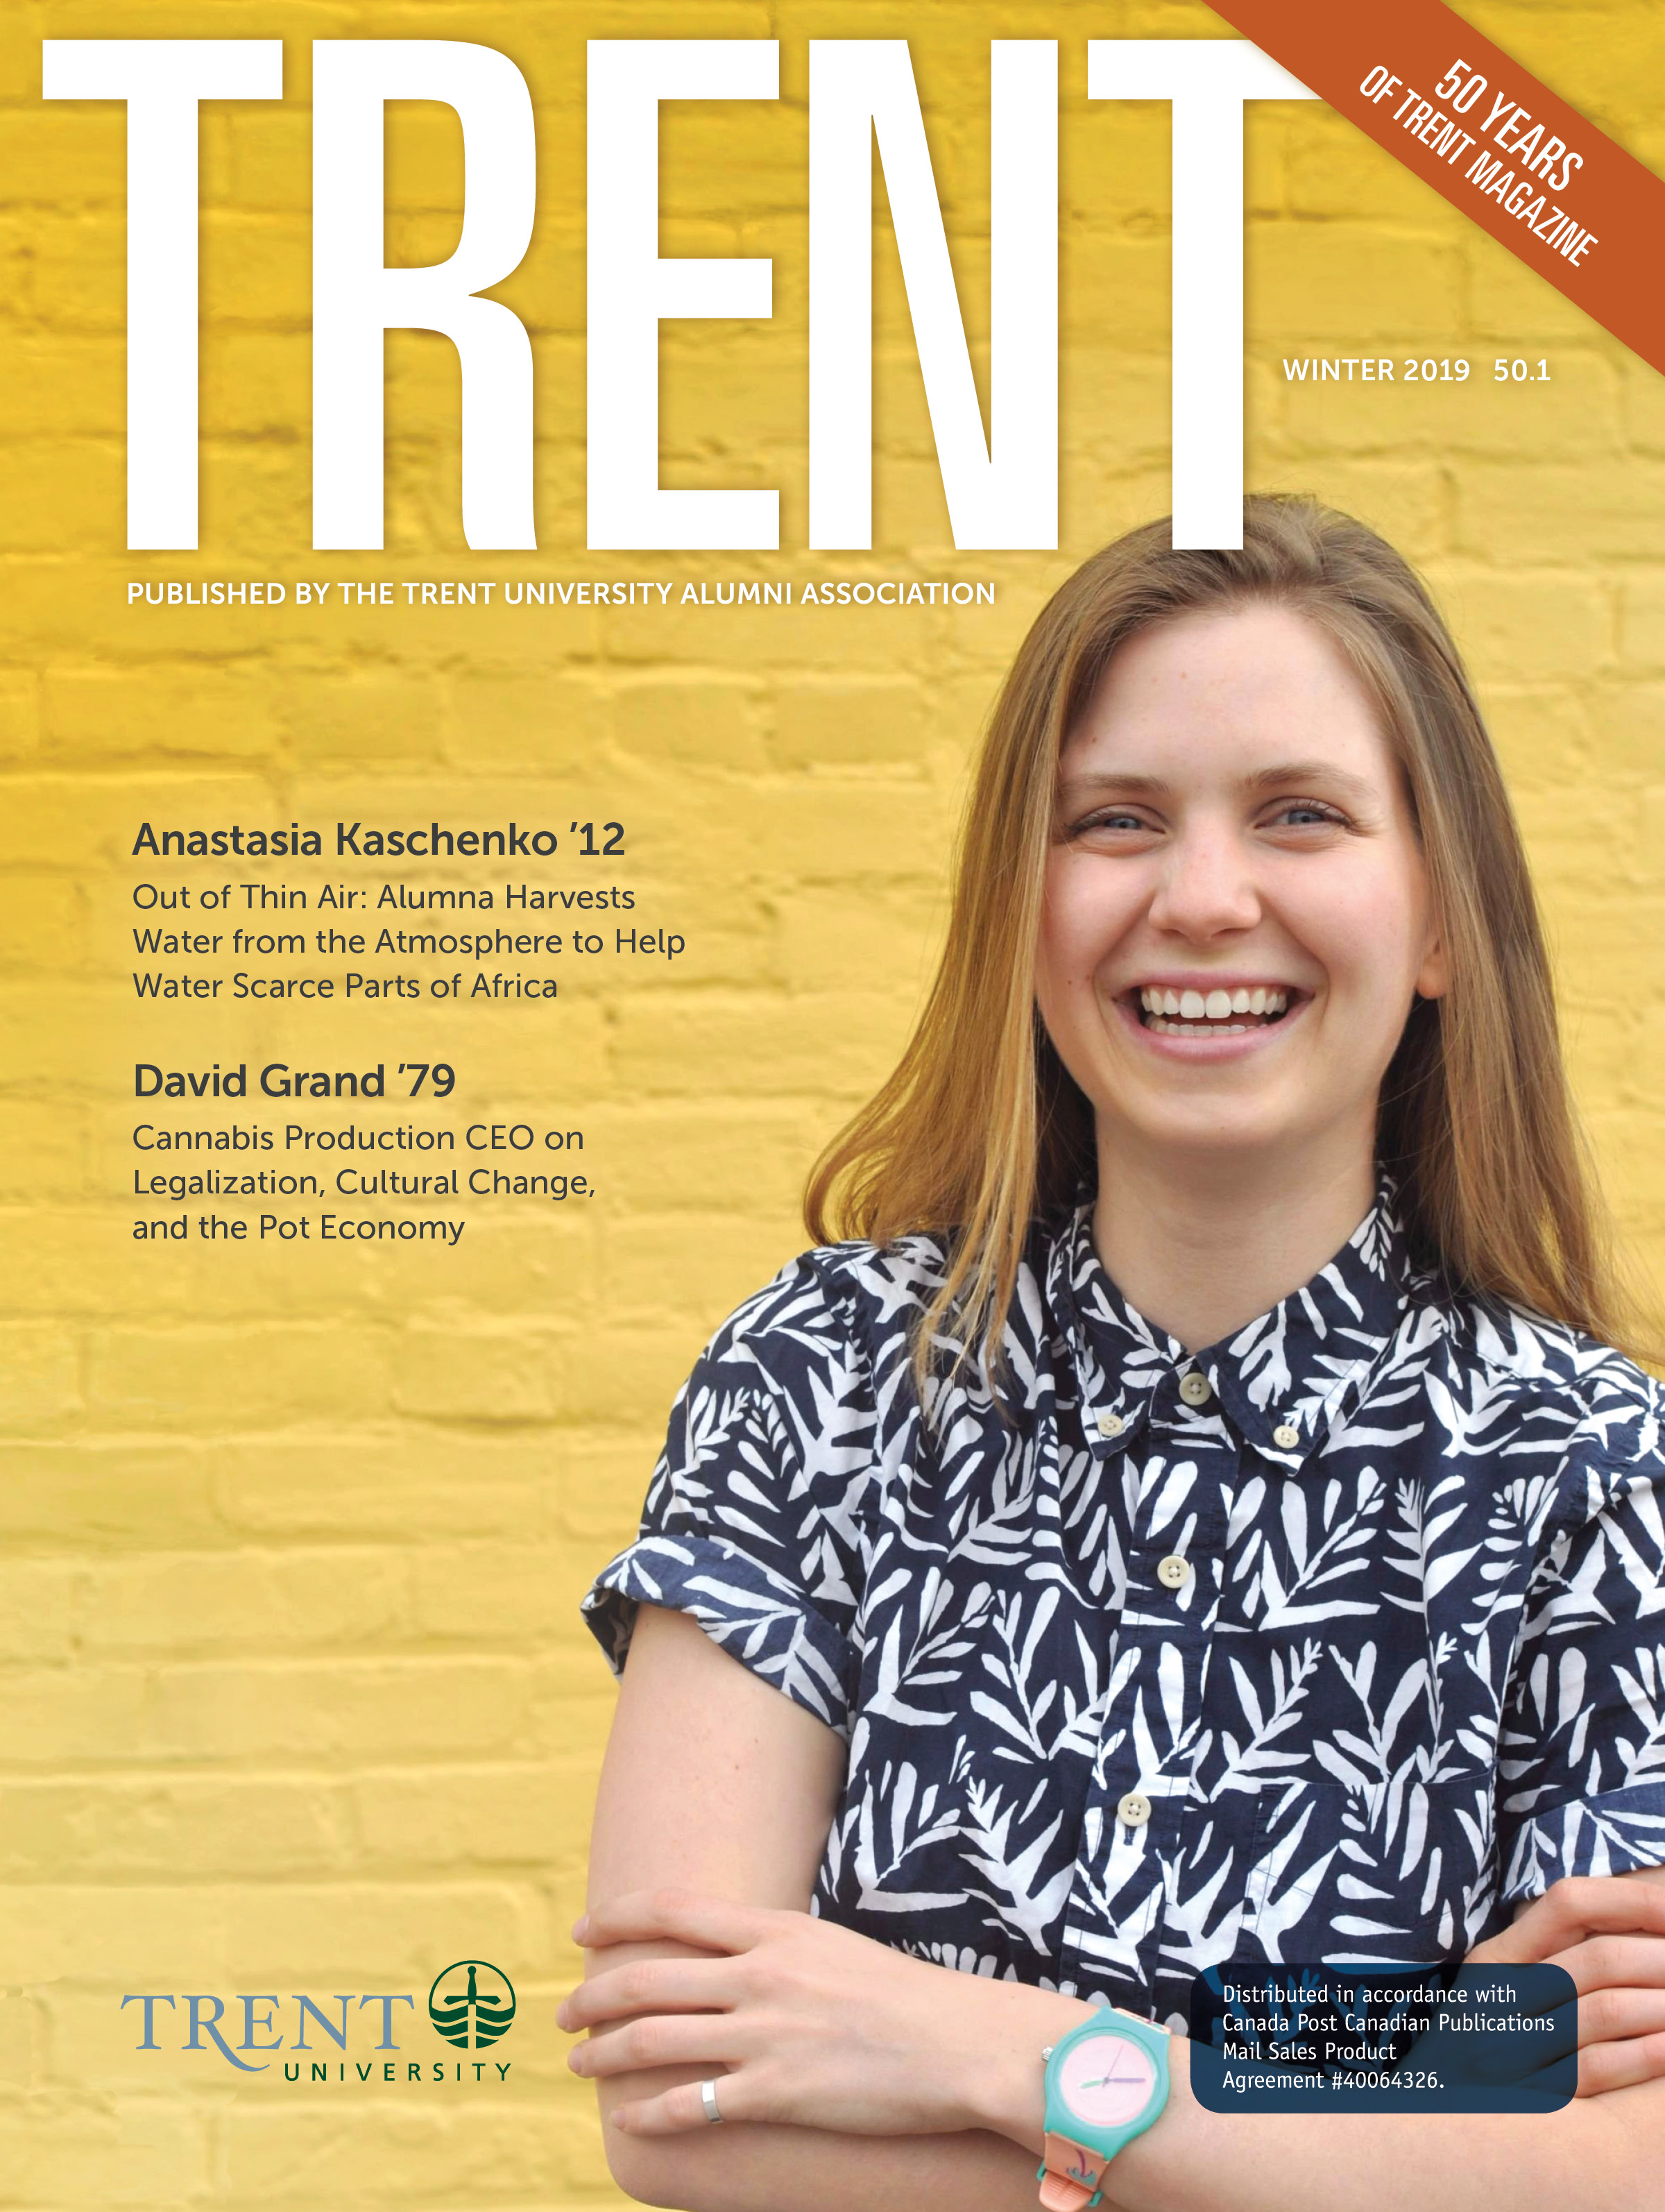 Trent Magazine Cover featuring Anastasia Kaschenko '12